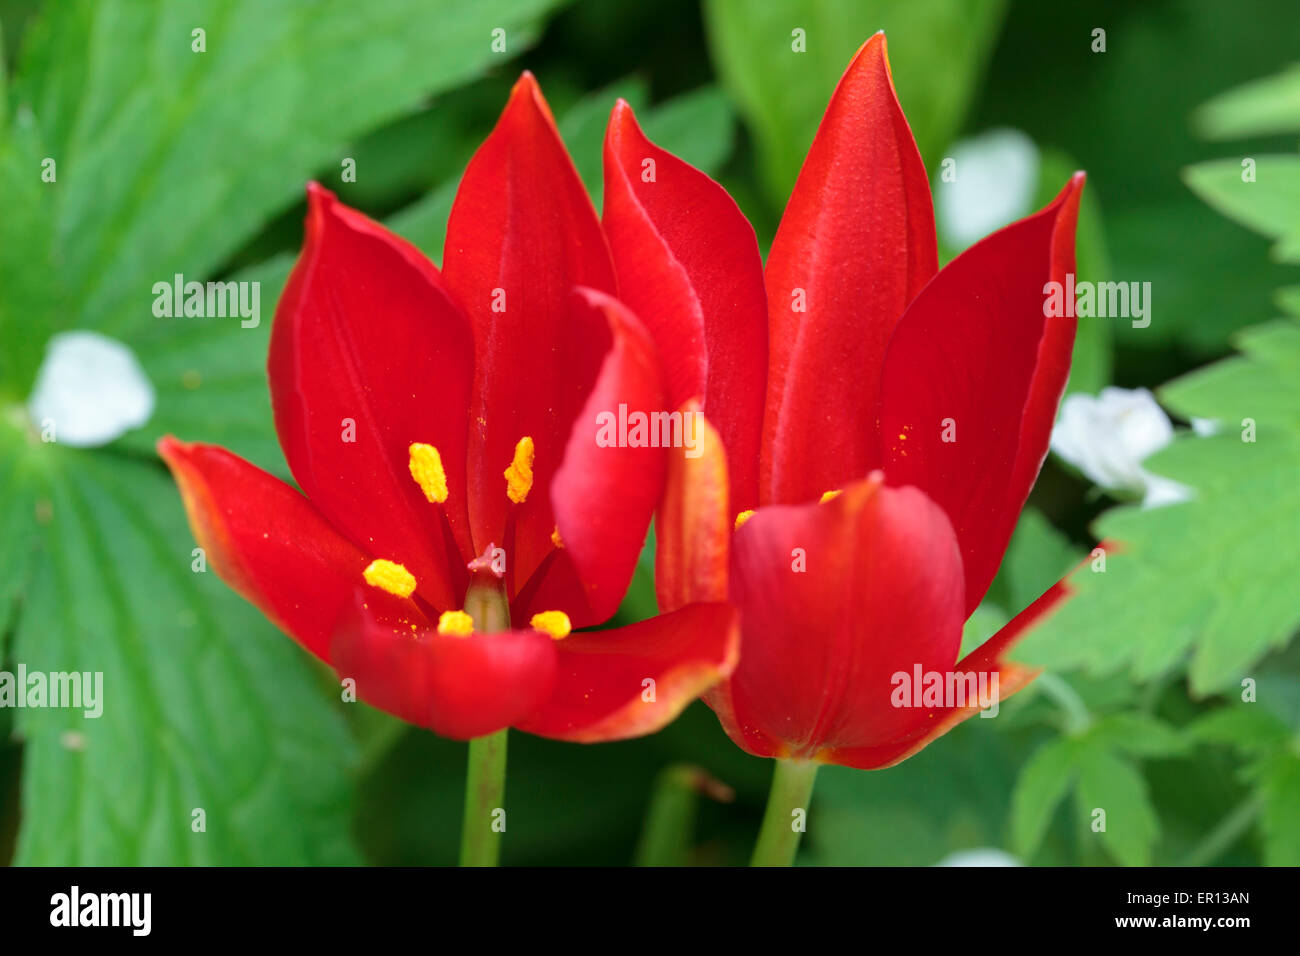 Flowers of the late blooming species tulip, Tulipa sprengeri - Stock Image